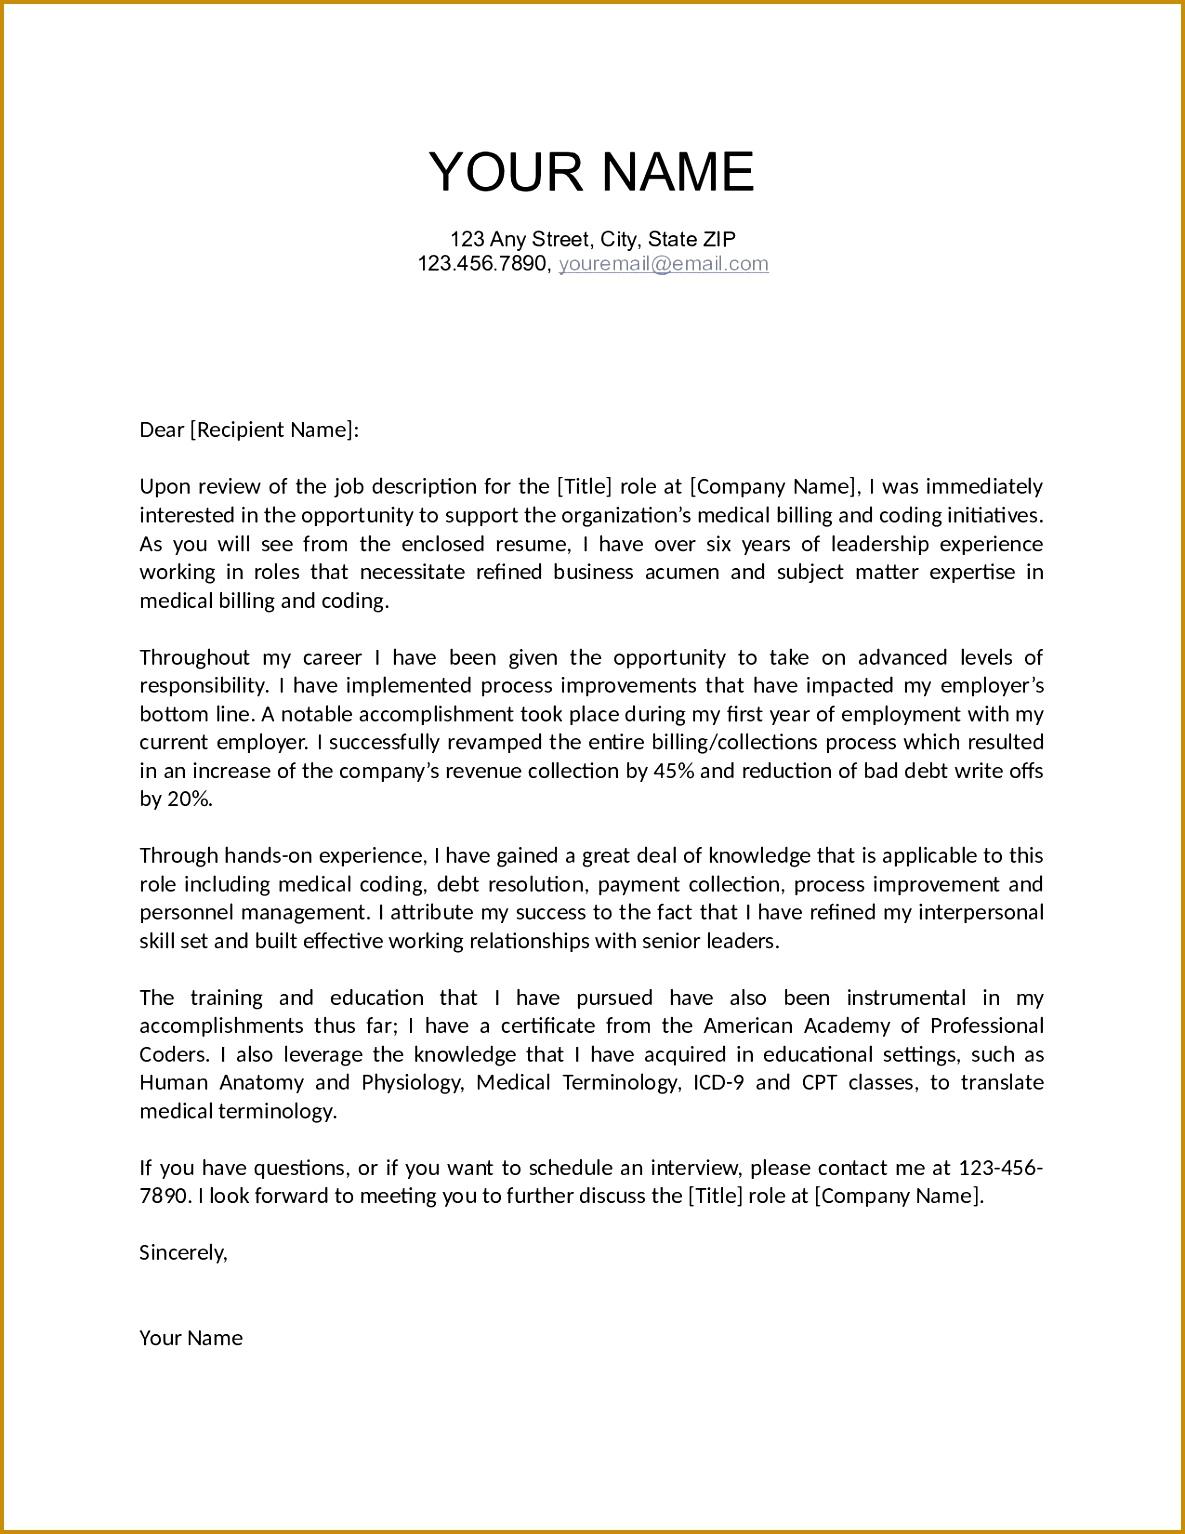 Best Cover Letters Unique Cover Letter Examples for Internship Beautiful Job Letter 0d 15341185